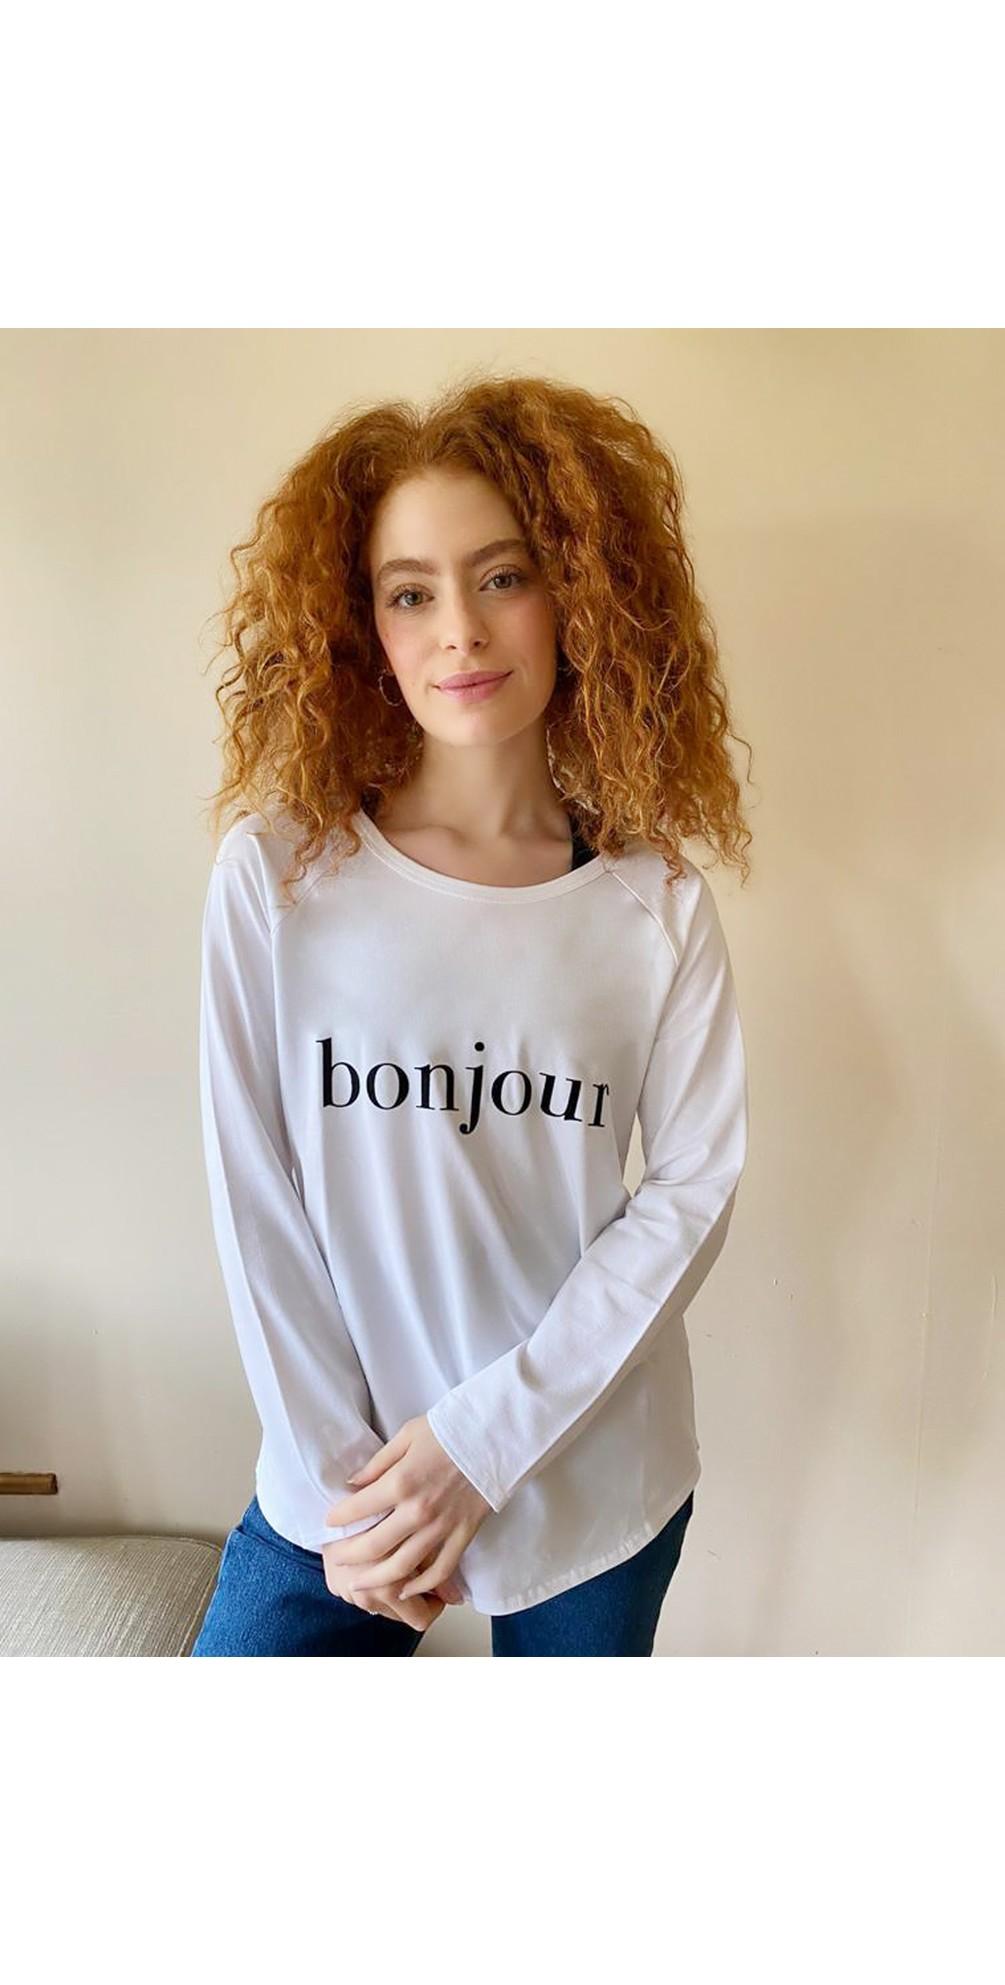 Tasha Bonjour Top - Gemini Exclusive ! main image